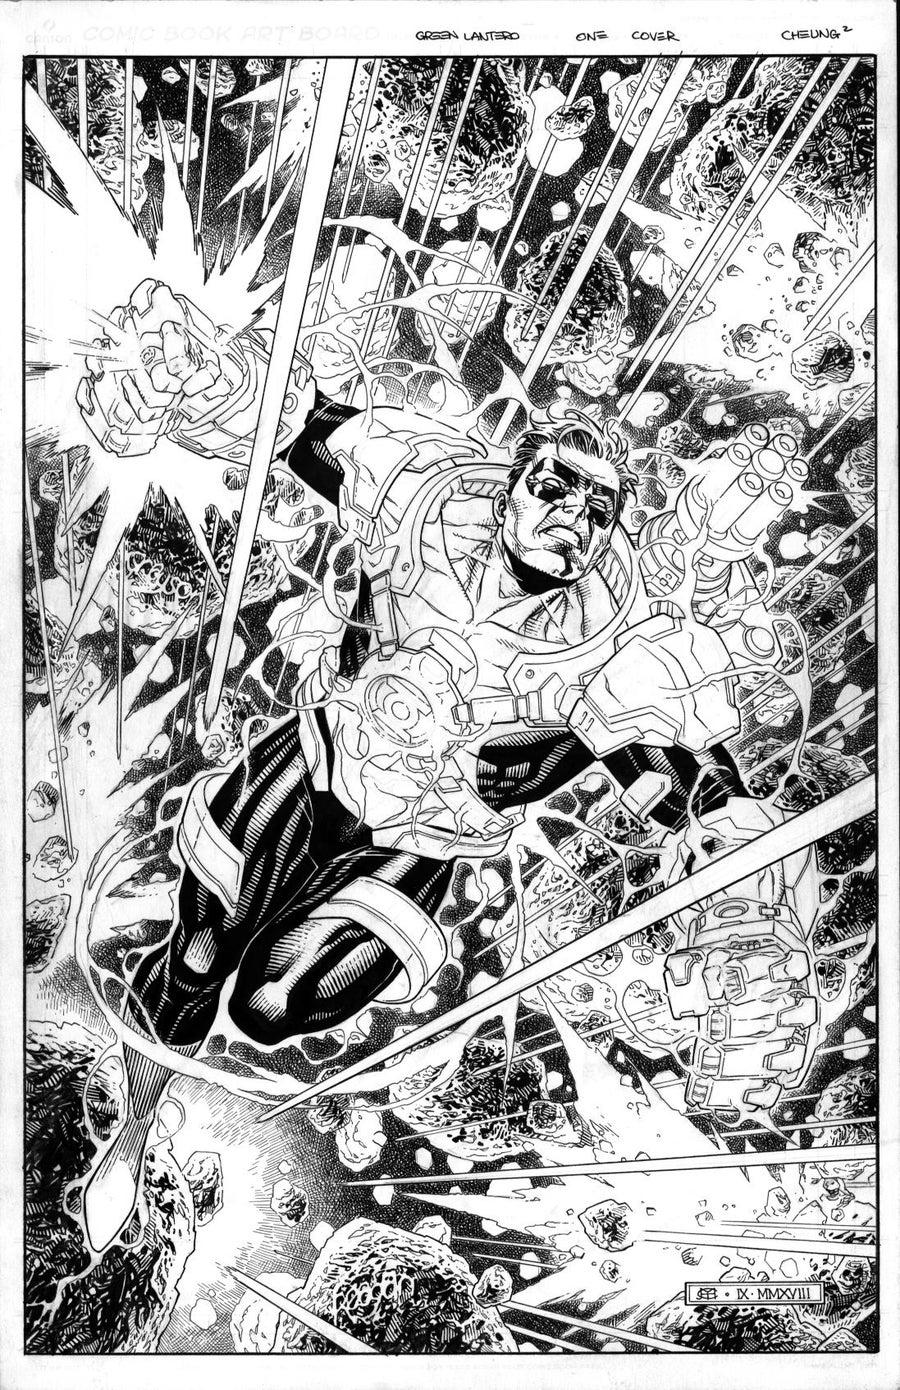 Green Lantern # 1